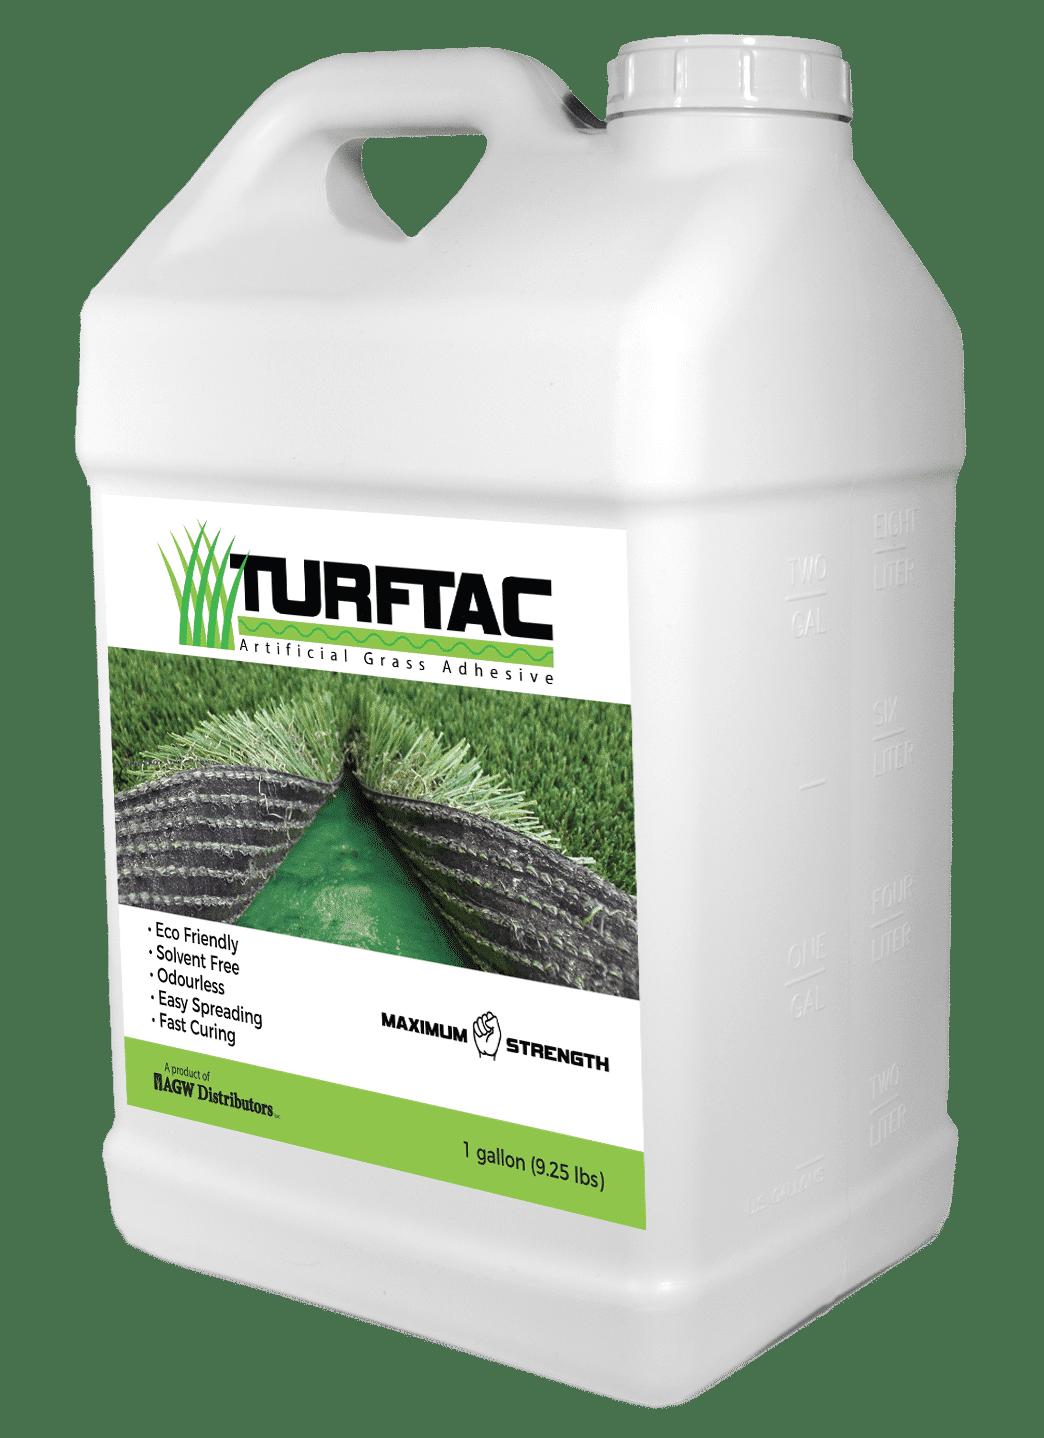 turf tac artificial grass seam glue for artificial grass installation